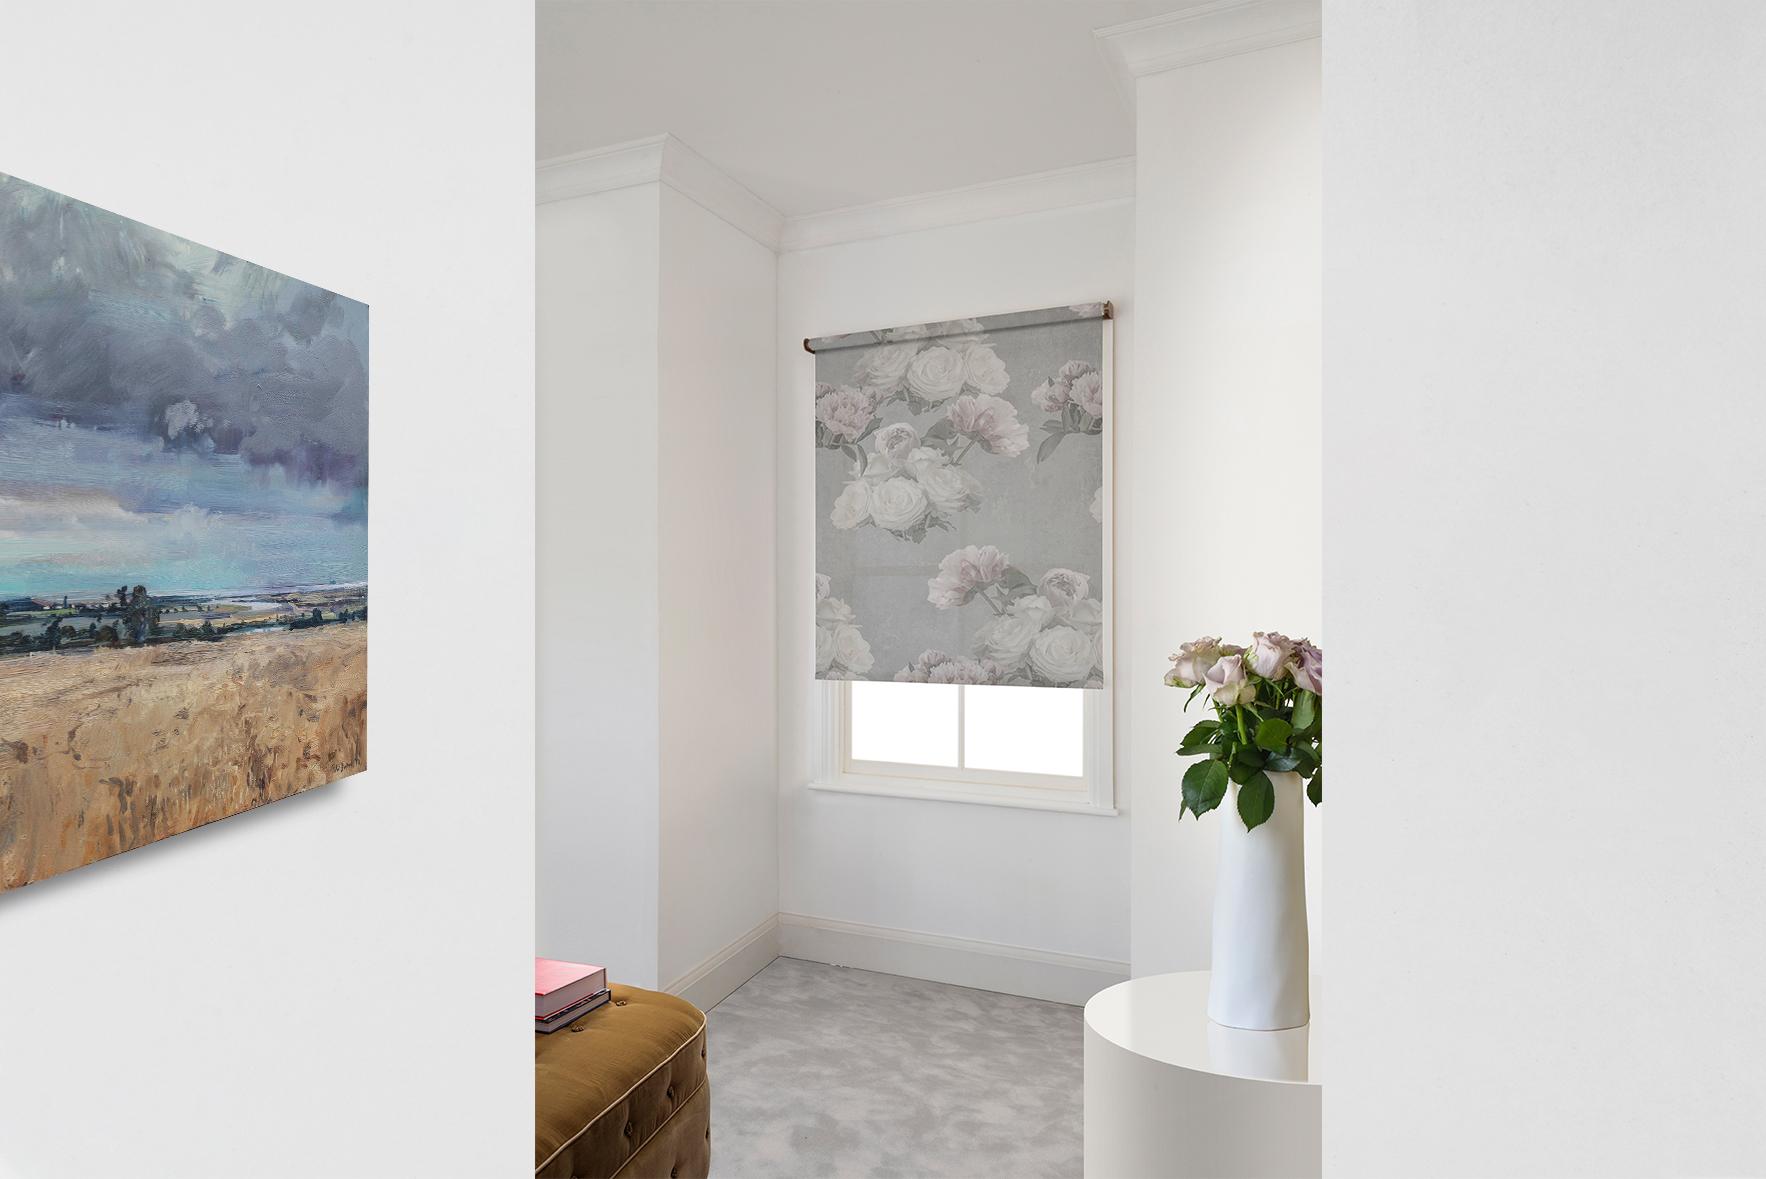 DSC_9223a-room.jpg